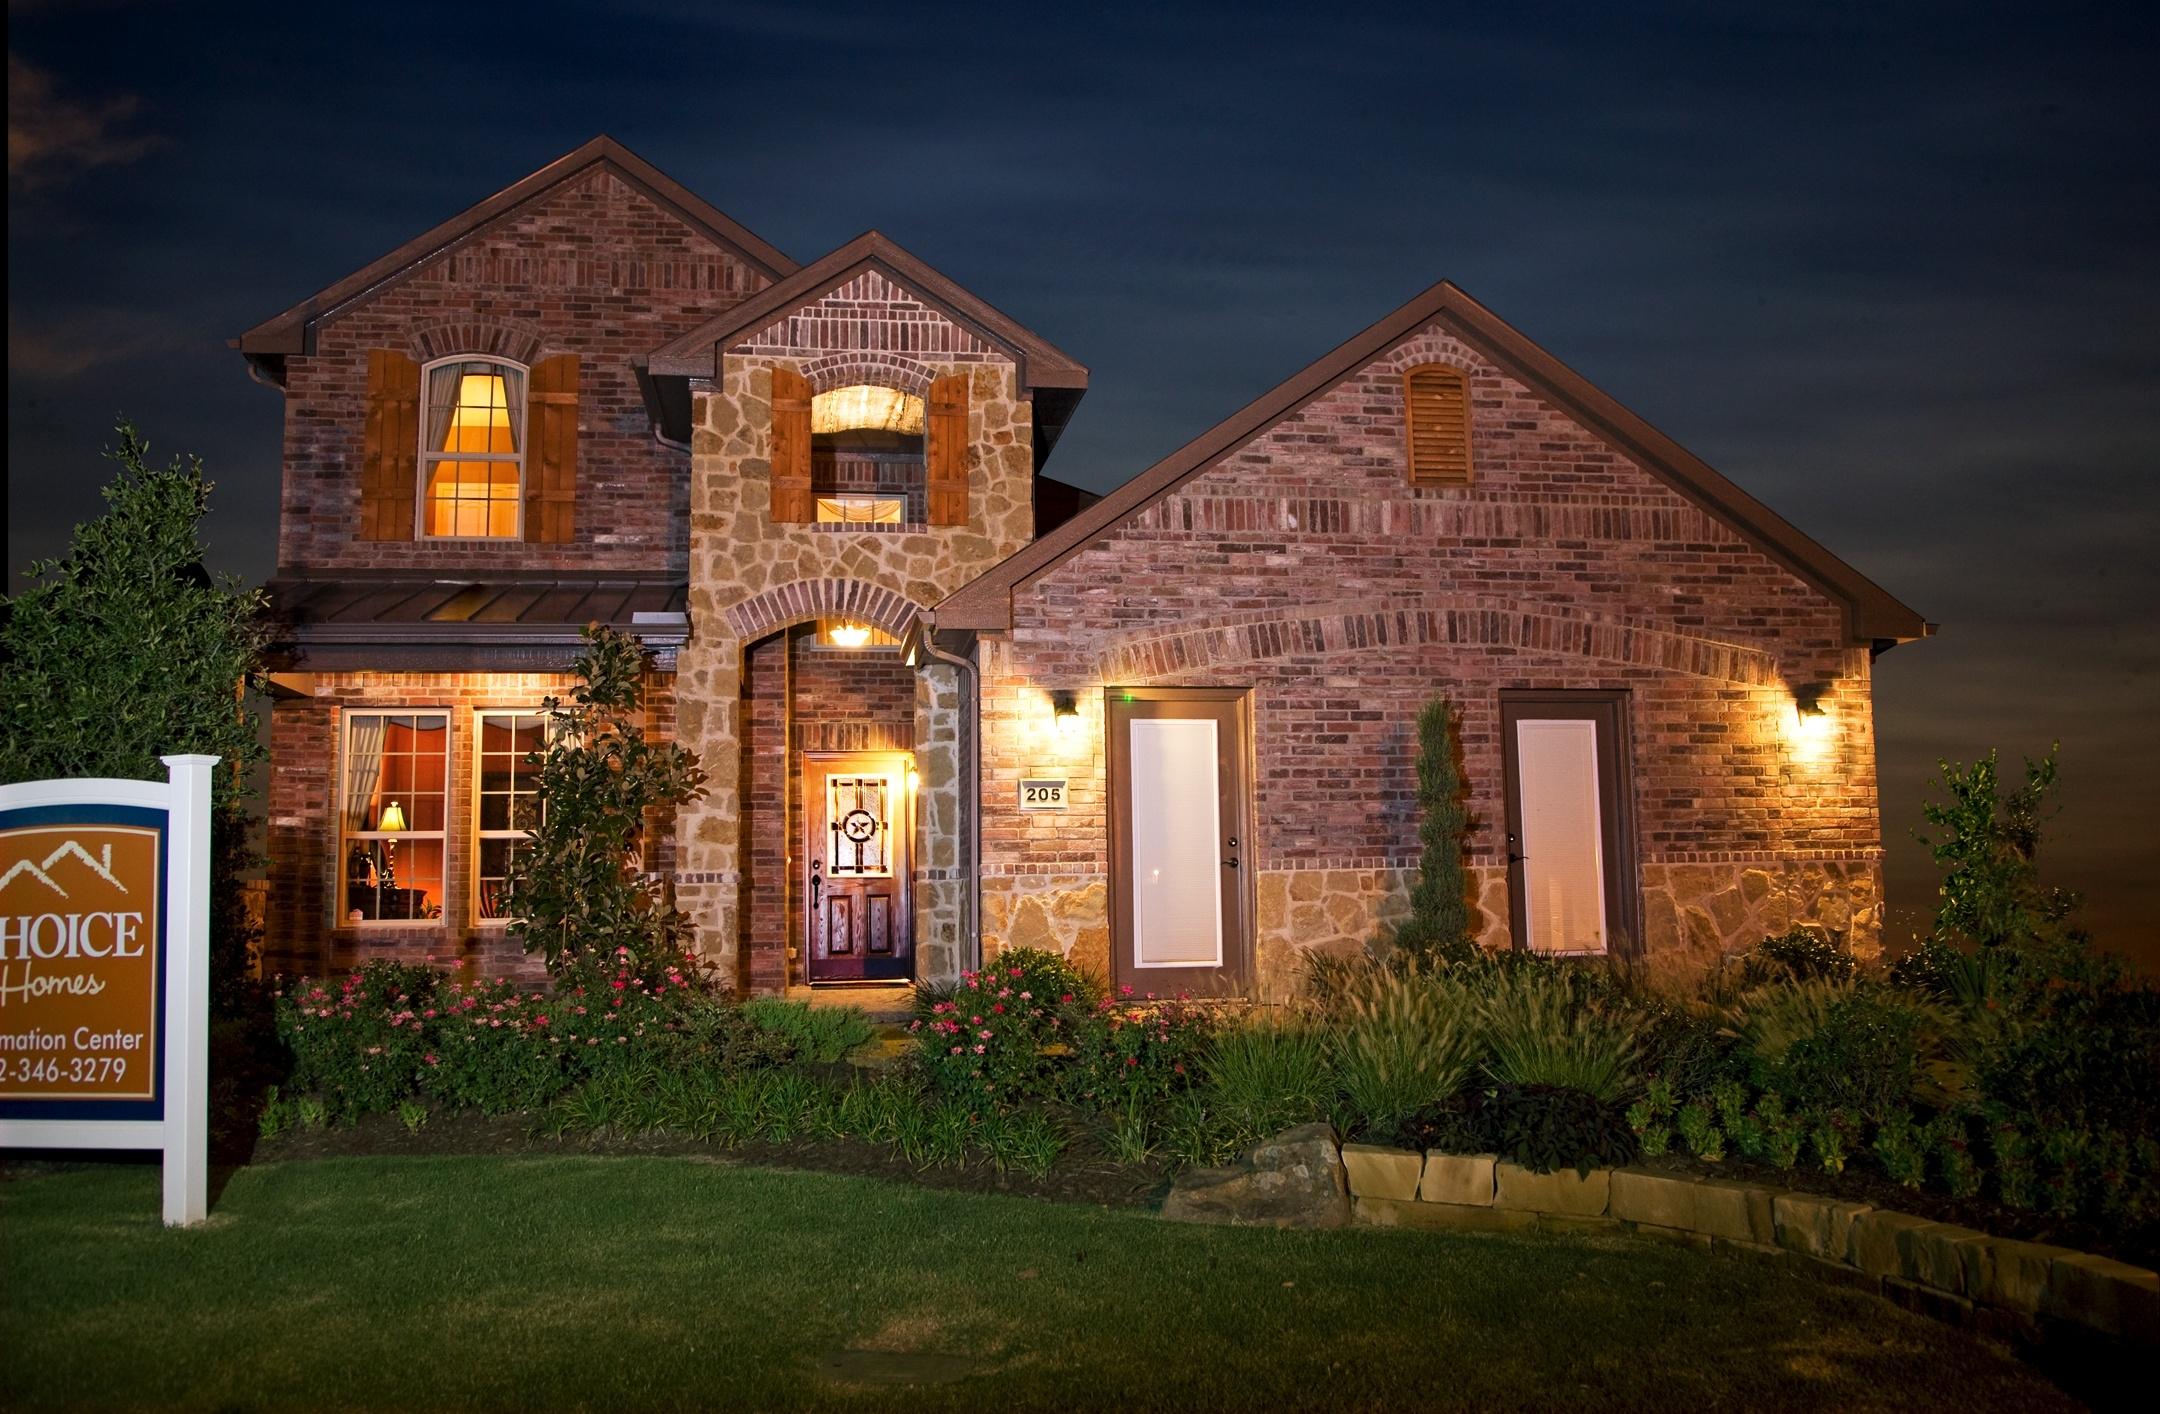 Impression Homes image 1